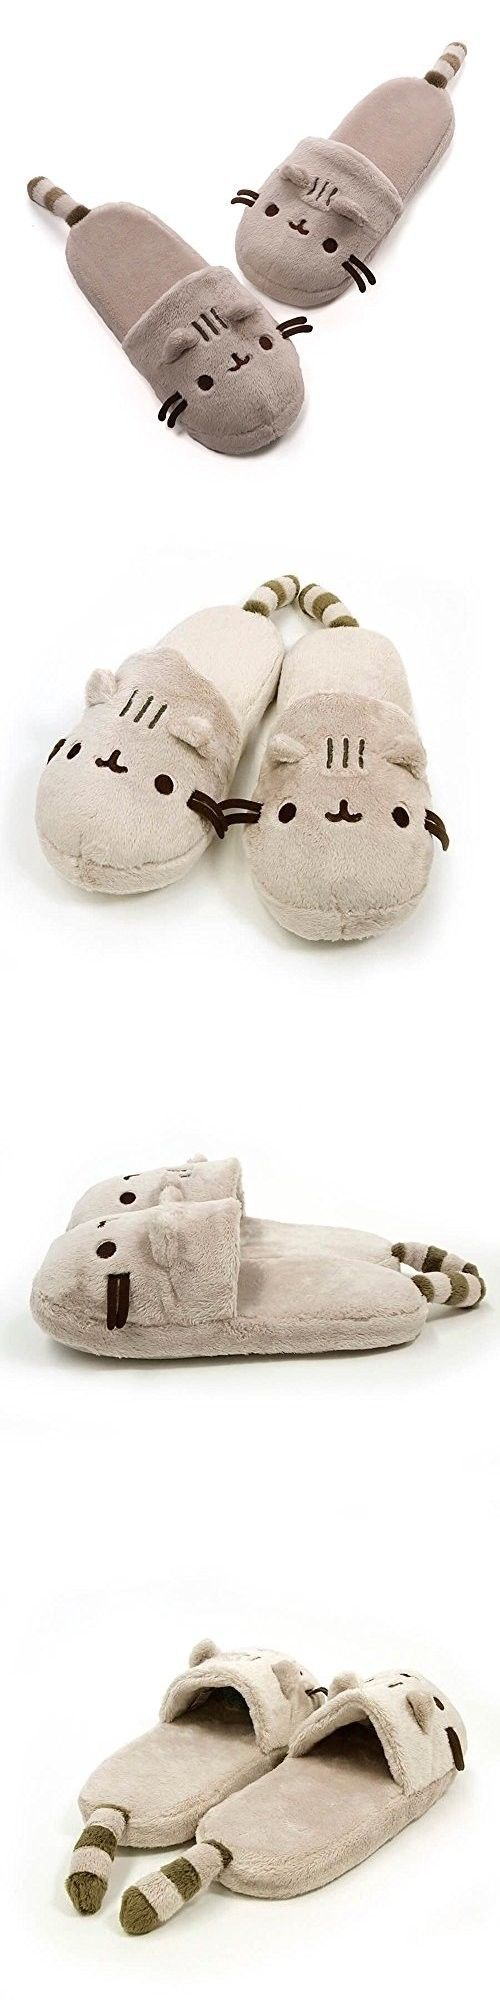 83efa07a511 Gund 2598  Gund Pusheen Cat Plush Stuffed Animal Slippers